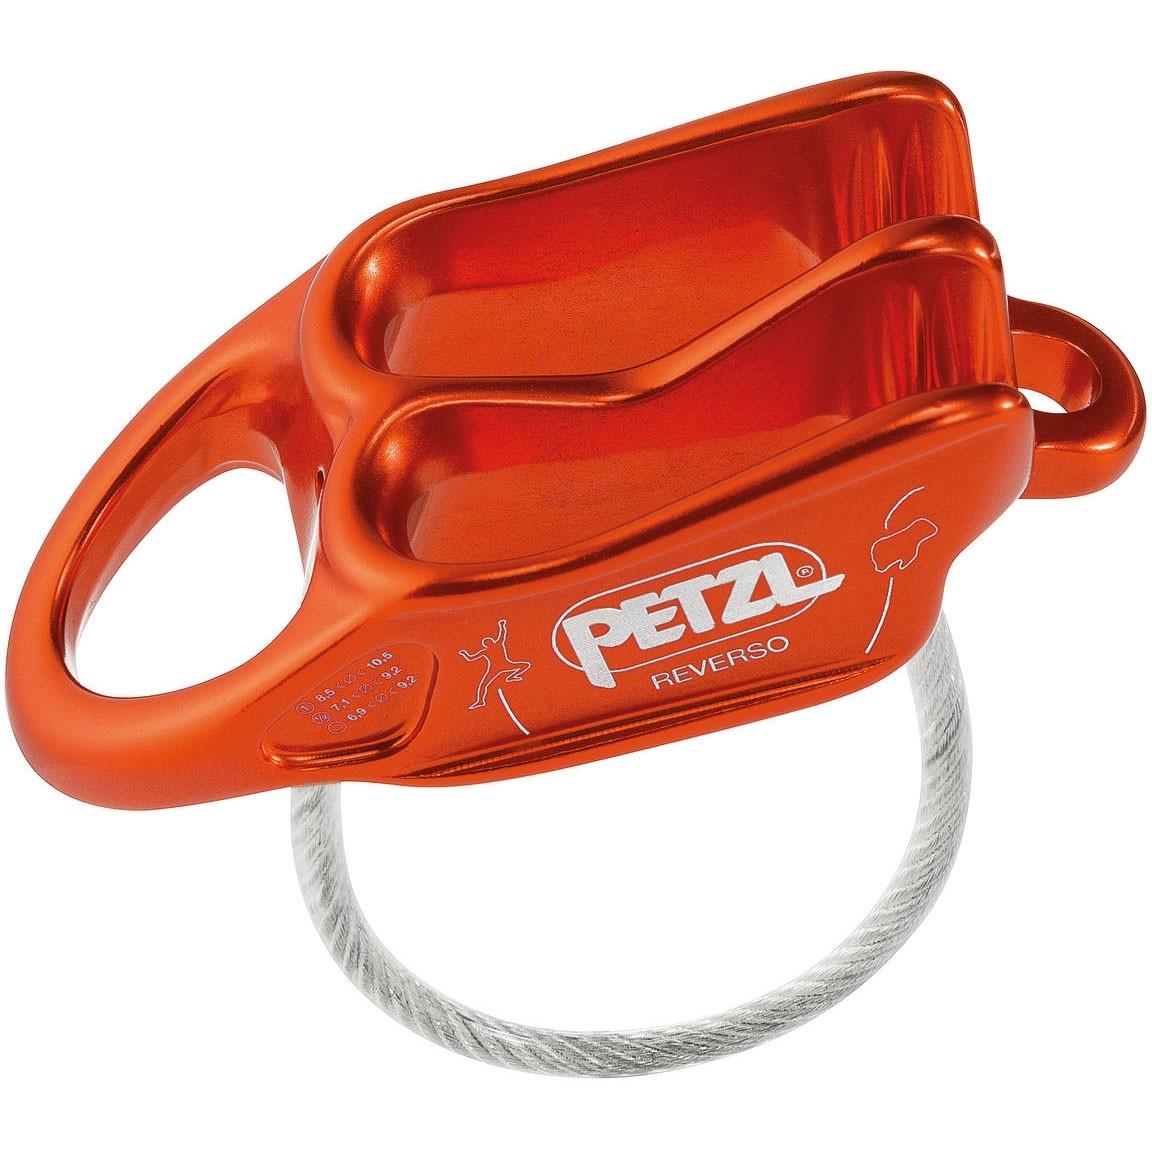 Petzl Reverso - Red/Orange